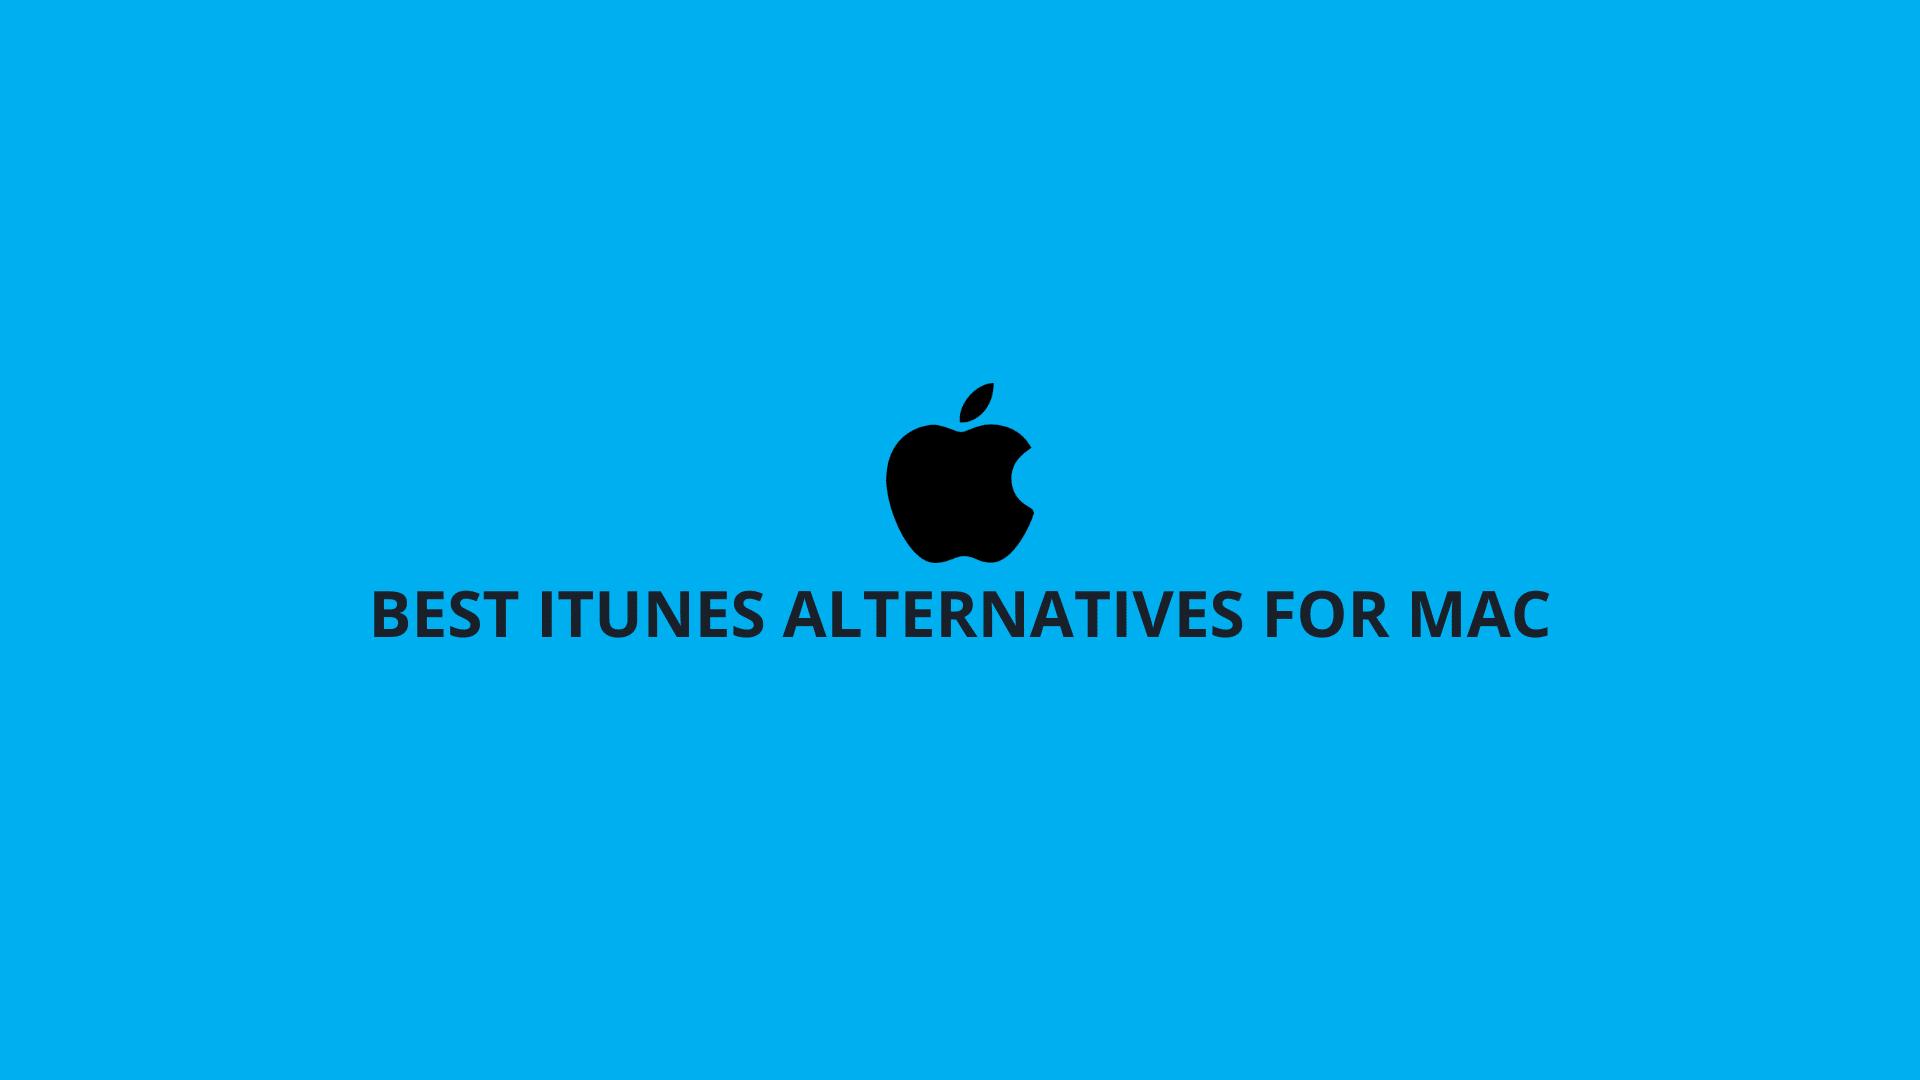 Best iTunes Alternatives For Mac